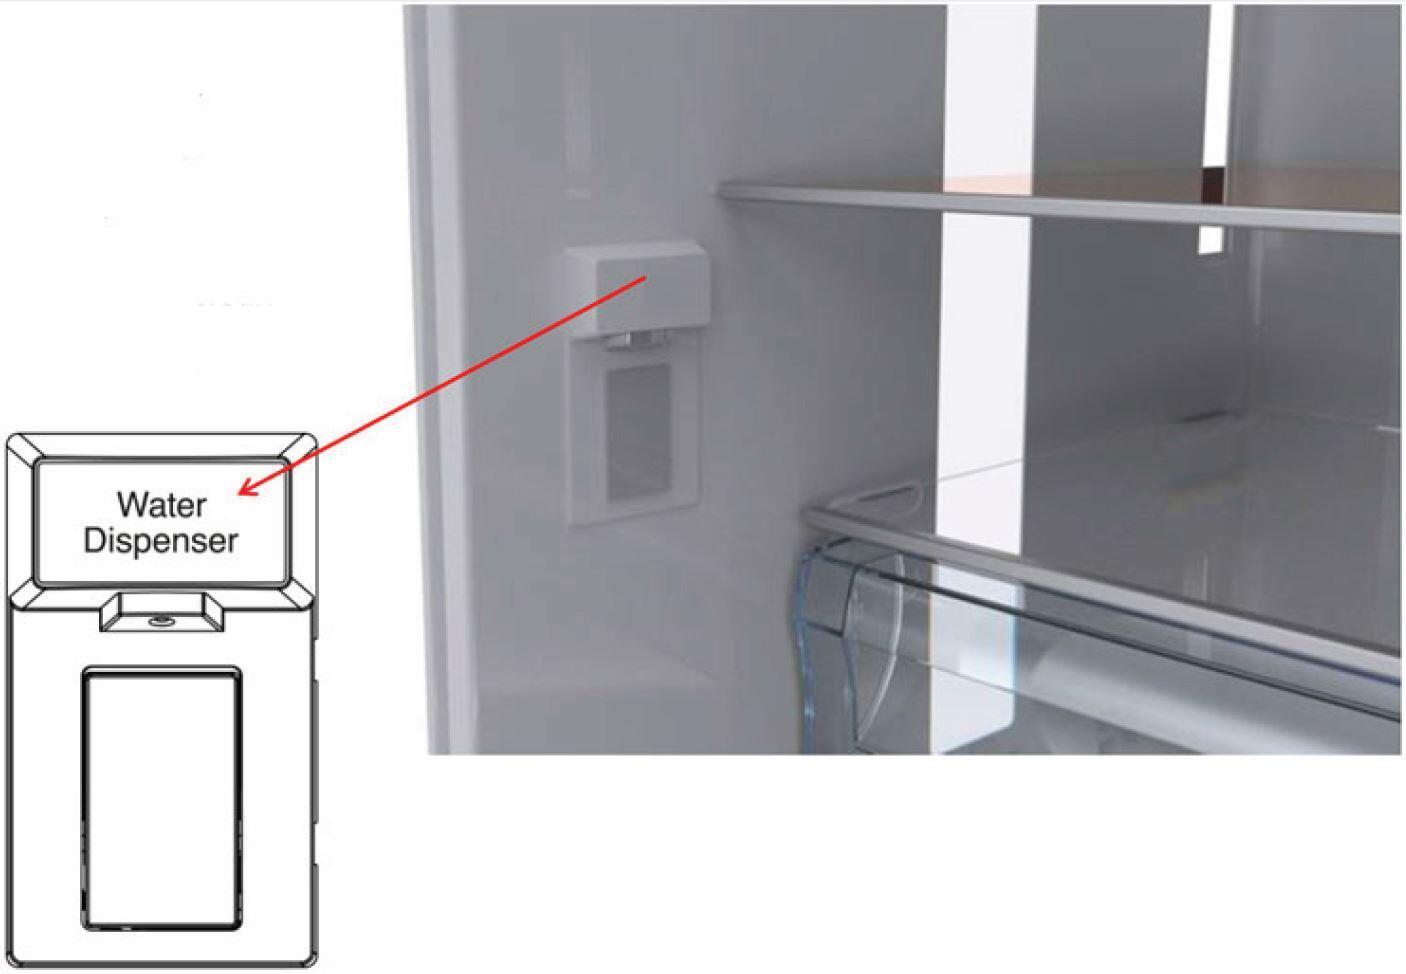 Dacor Distinctive f · Dacor Distinctive Internal Water Dispenser ...  sc 1 st  Appliances Connection & Dacor DTF36FCS 36 Inch Distinctive Series Counter Depth French ... pezcame.com